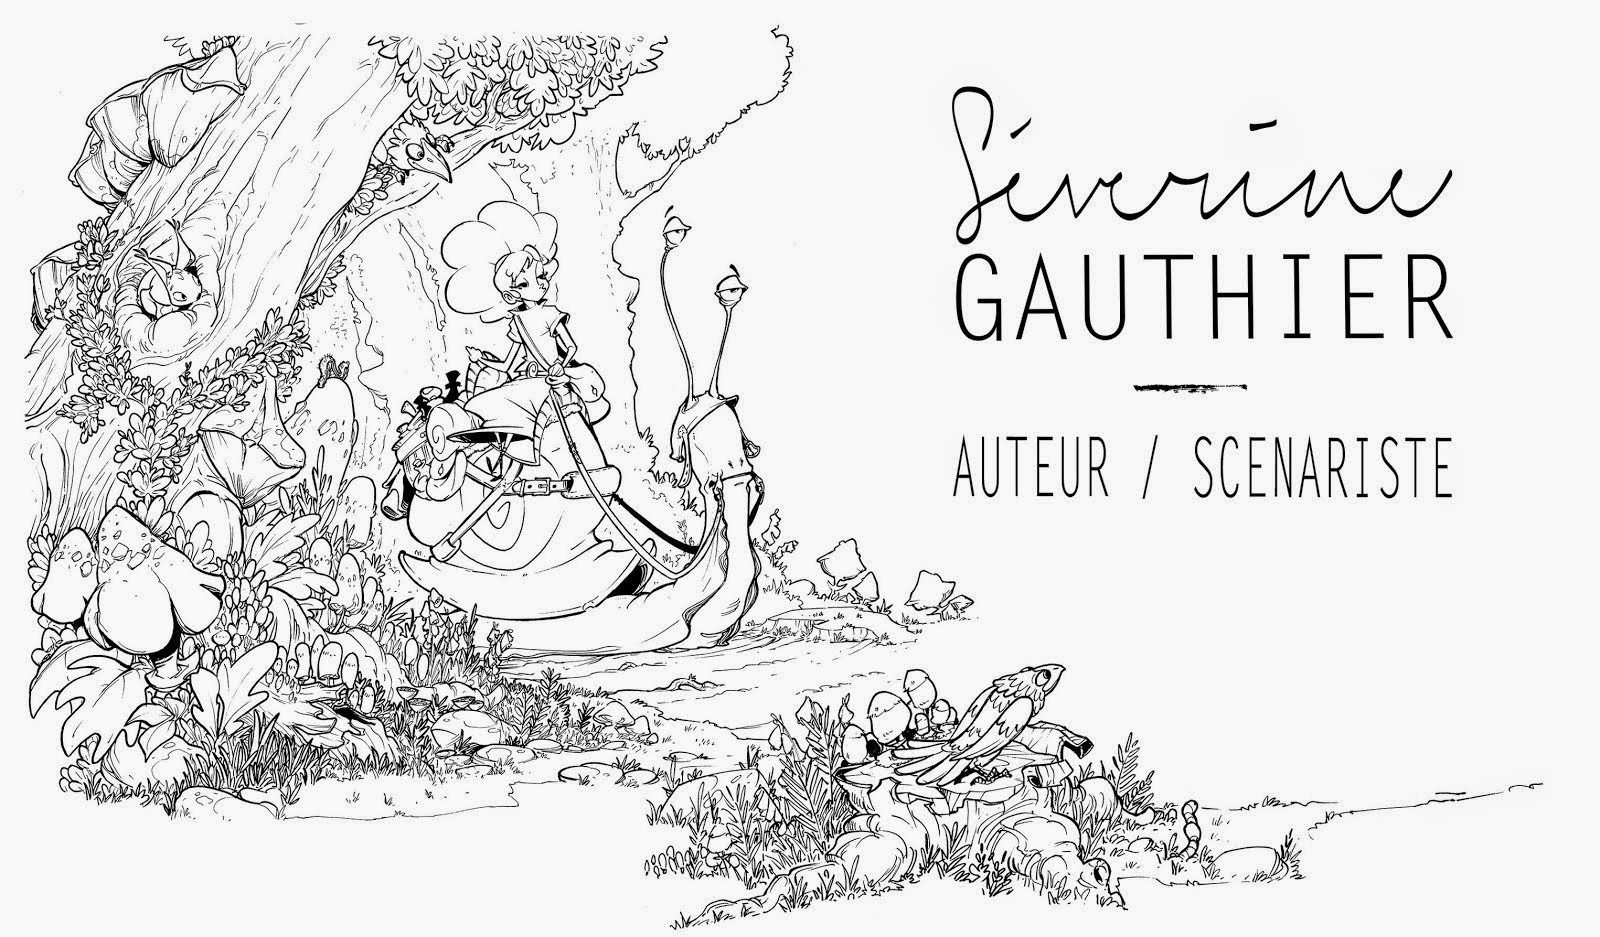 Séverine Gauthier / Auteur Scénariste